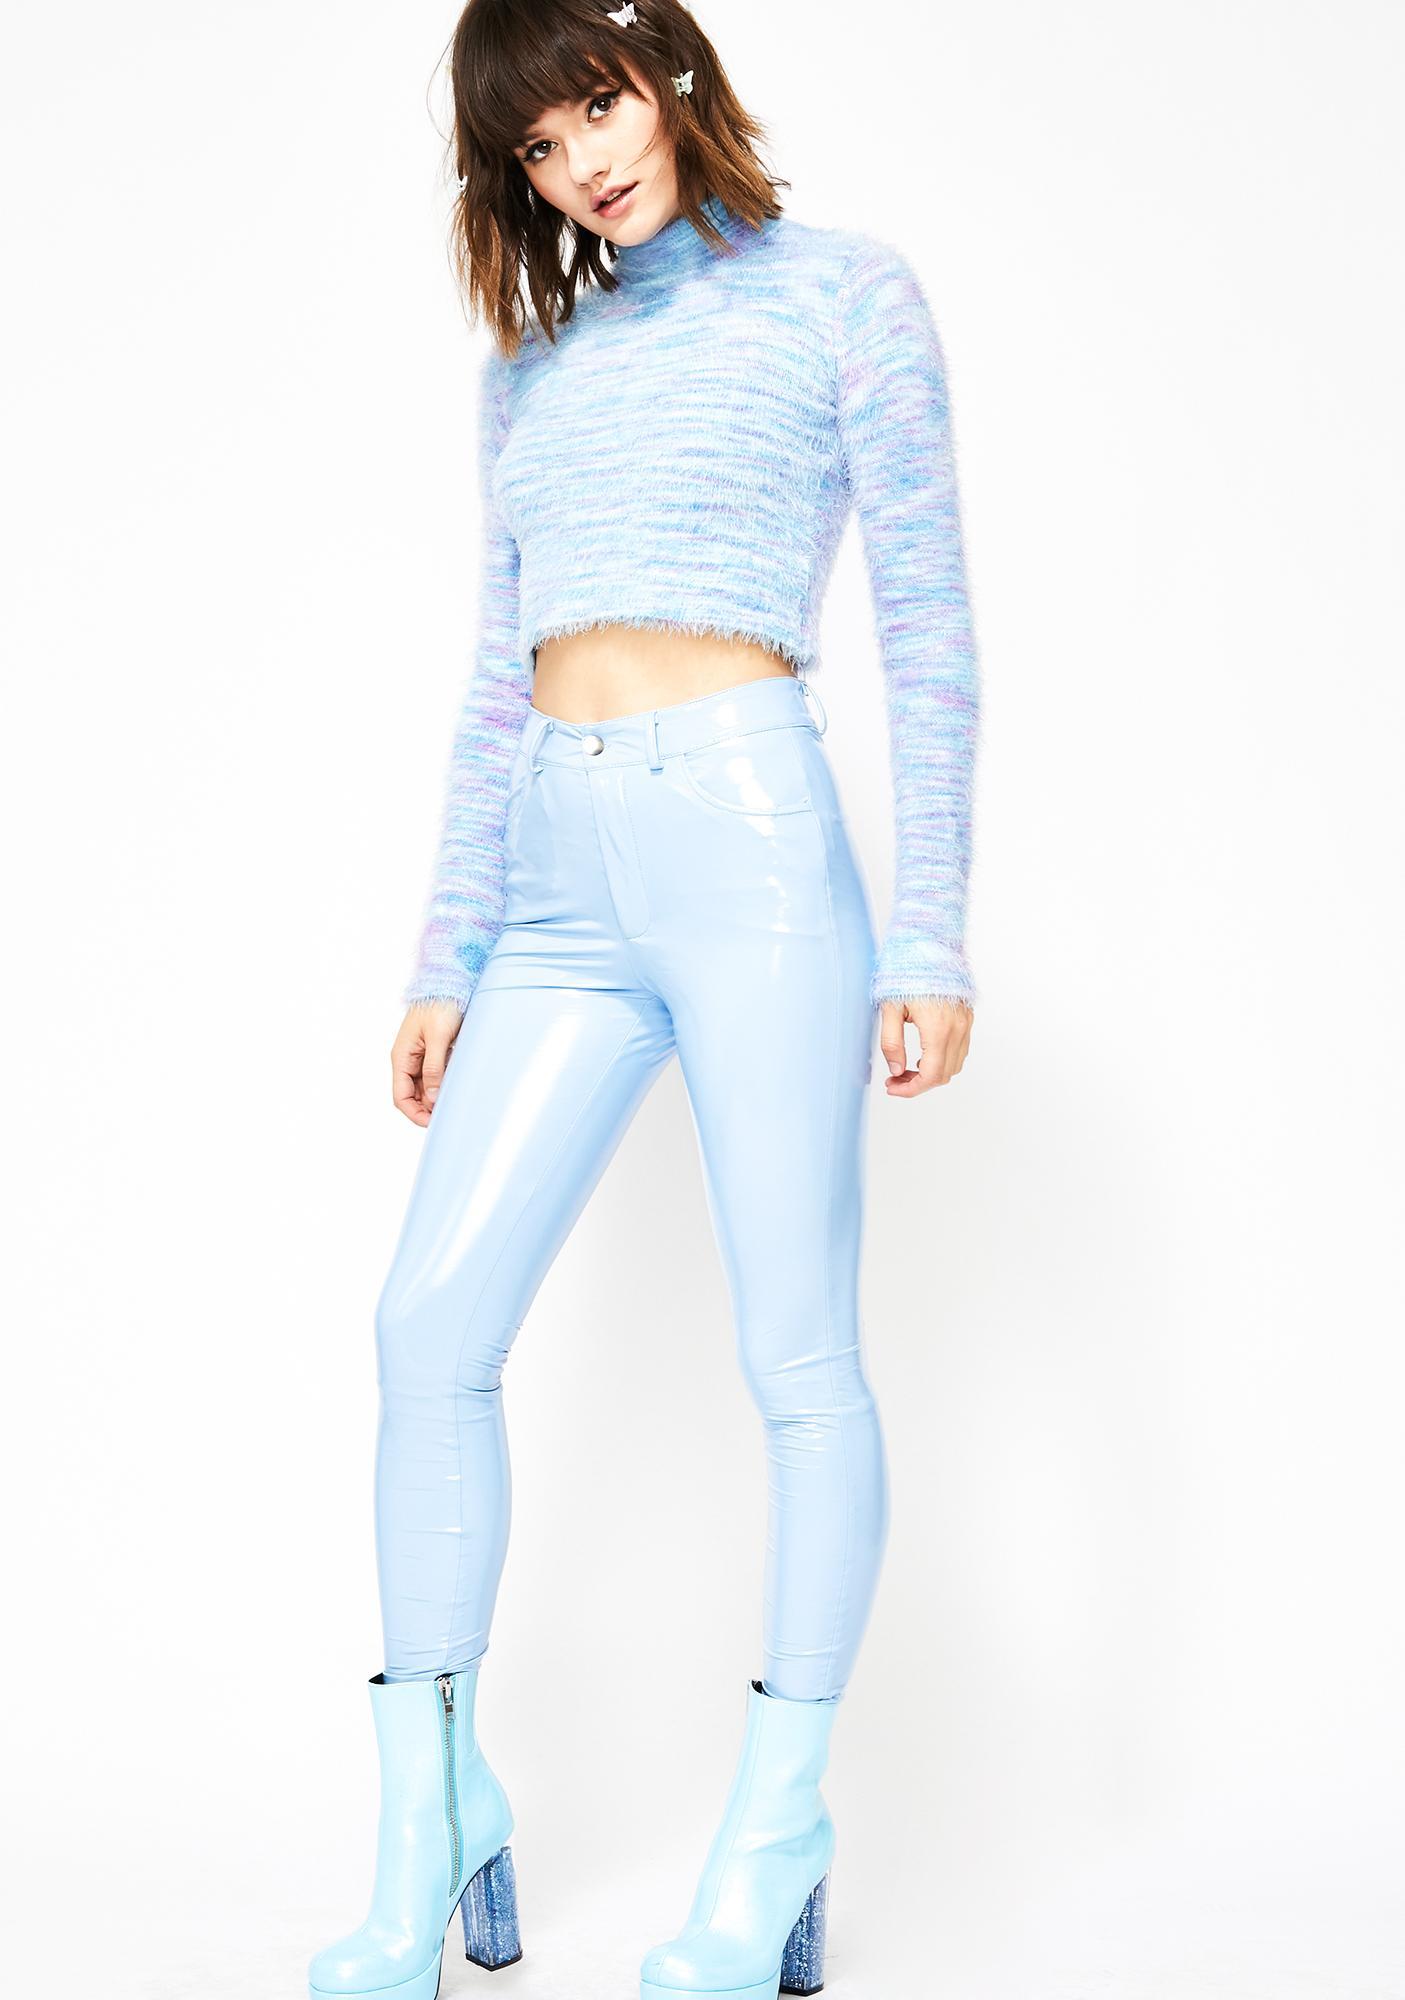 Sky Legally Flawless Vinyl Pants